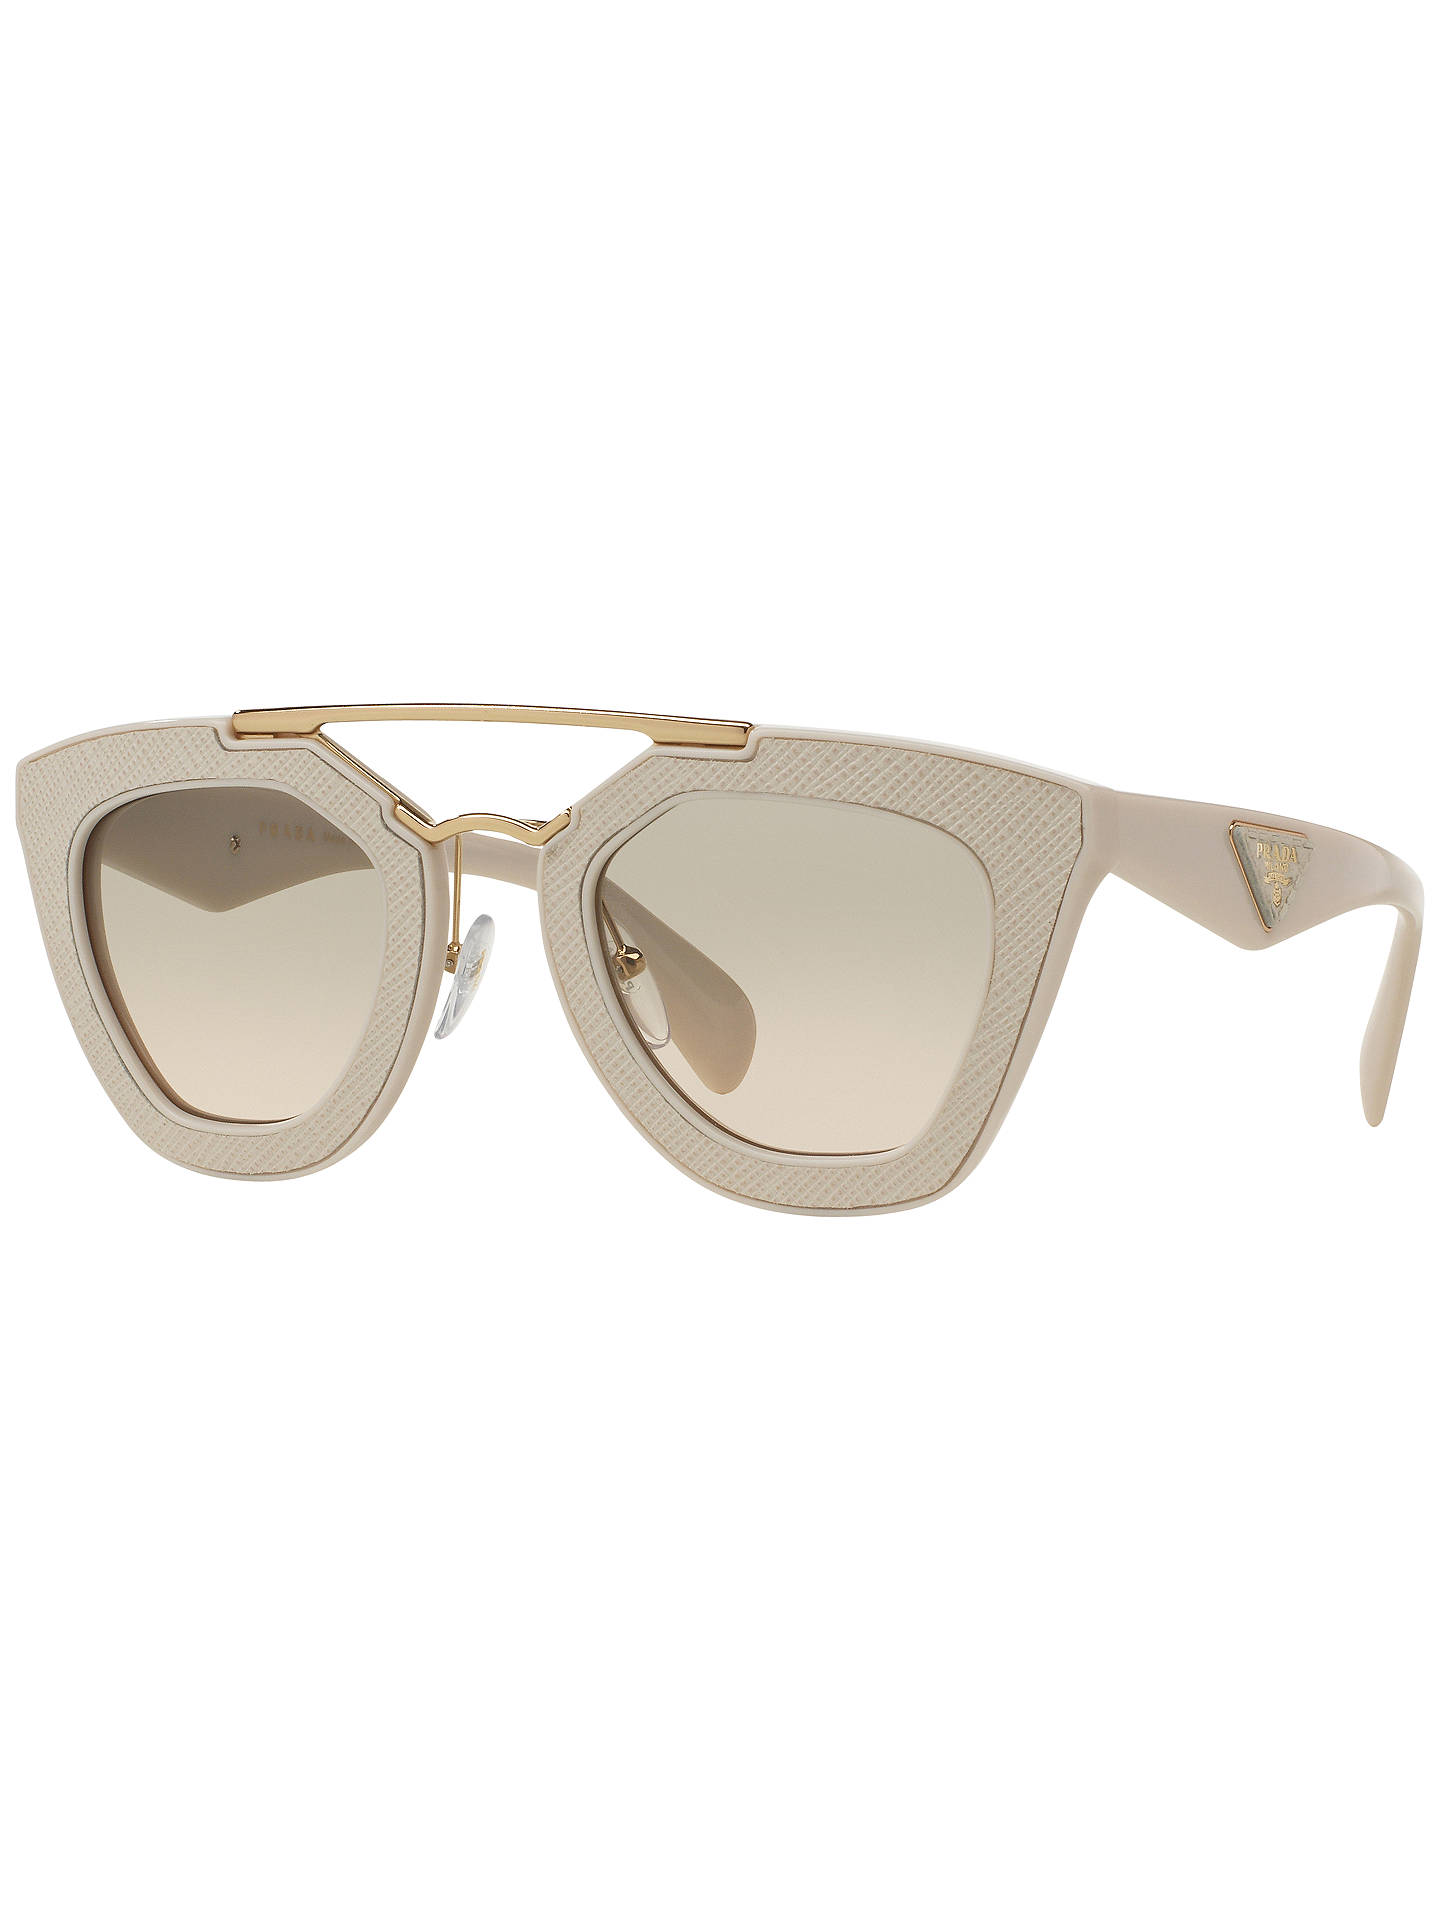 Prada PR14SS Ornate Textured D-Frame Gradient Sunglasses, Beige at ...